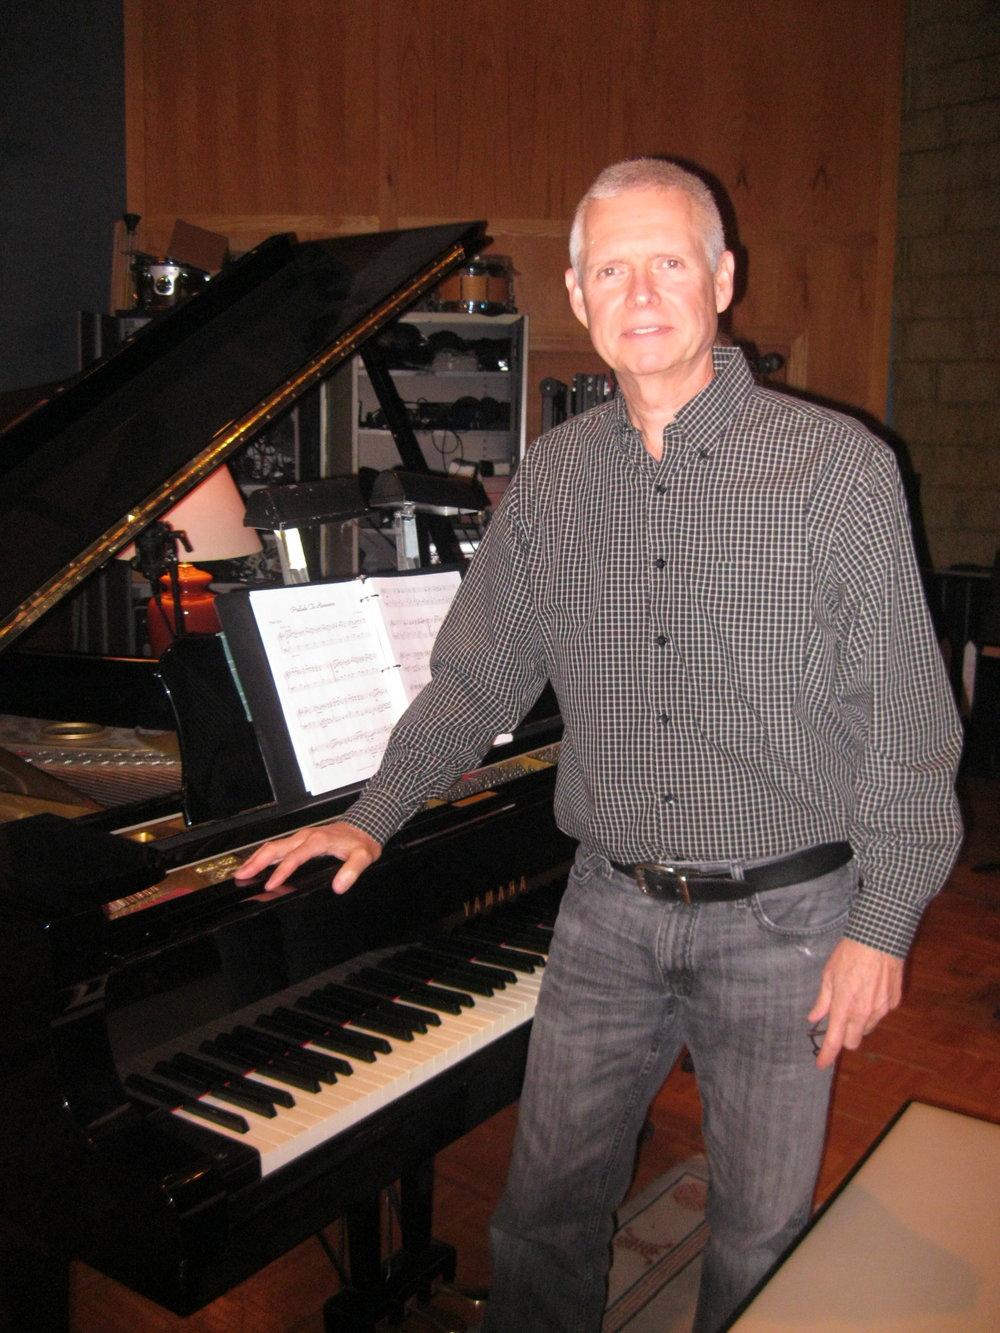 R.J. Mitchell in the recording studio